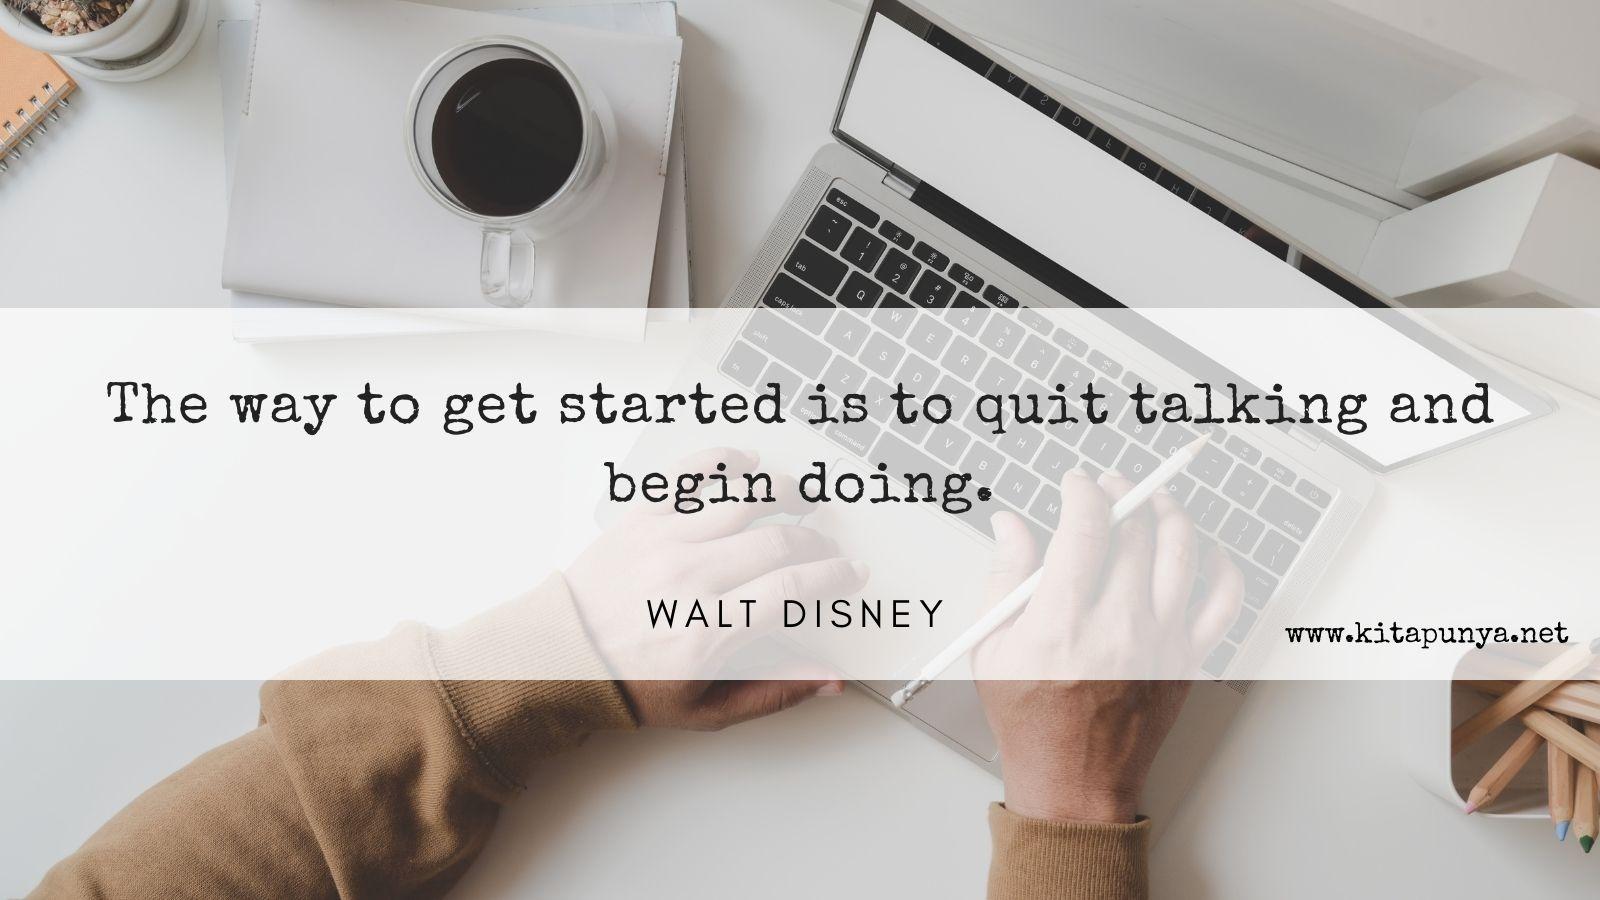 kata motivasi lakukan just do it